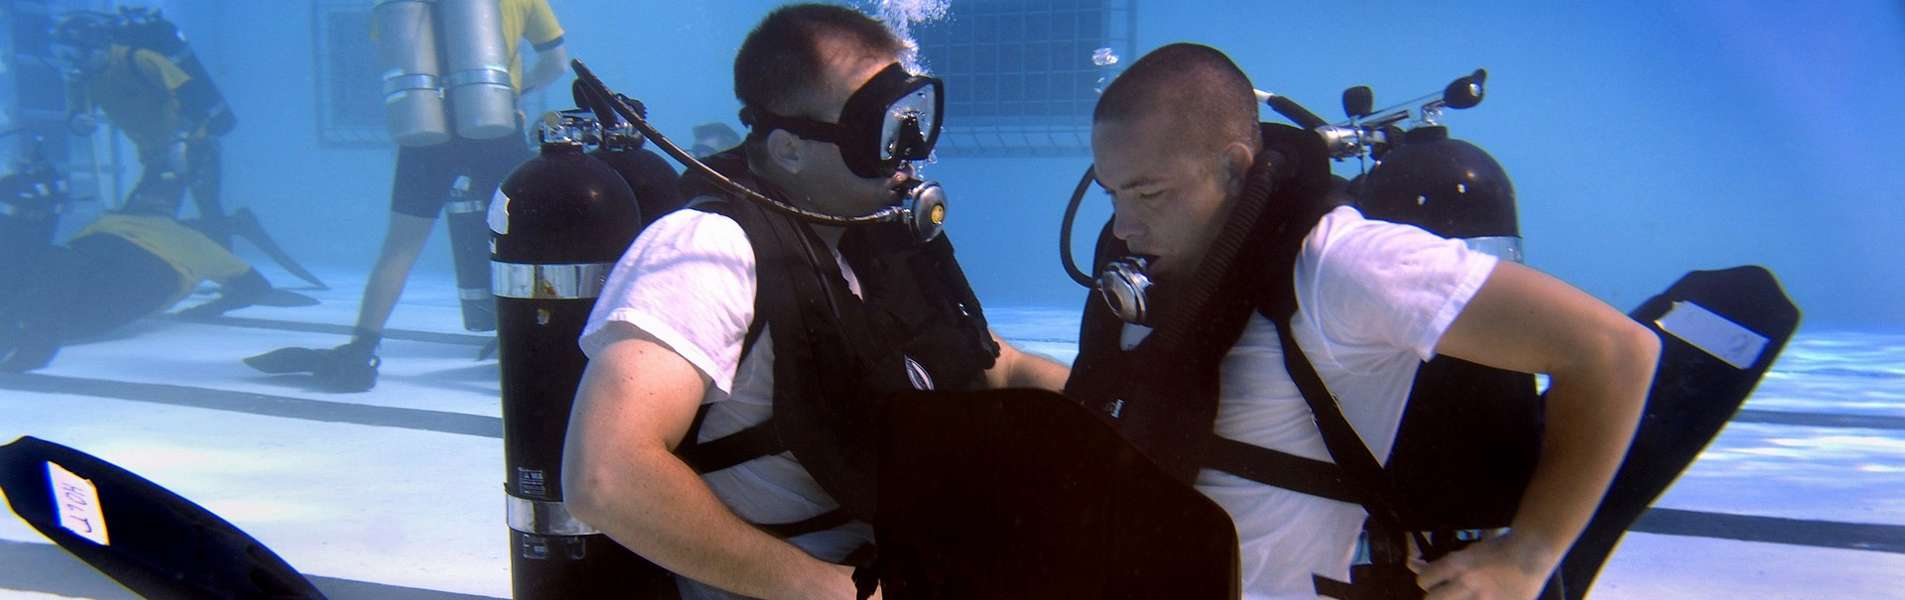 Scuba diving training